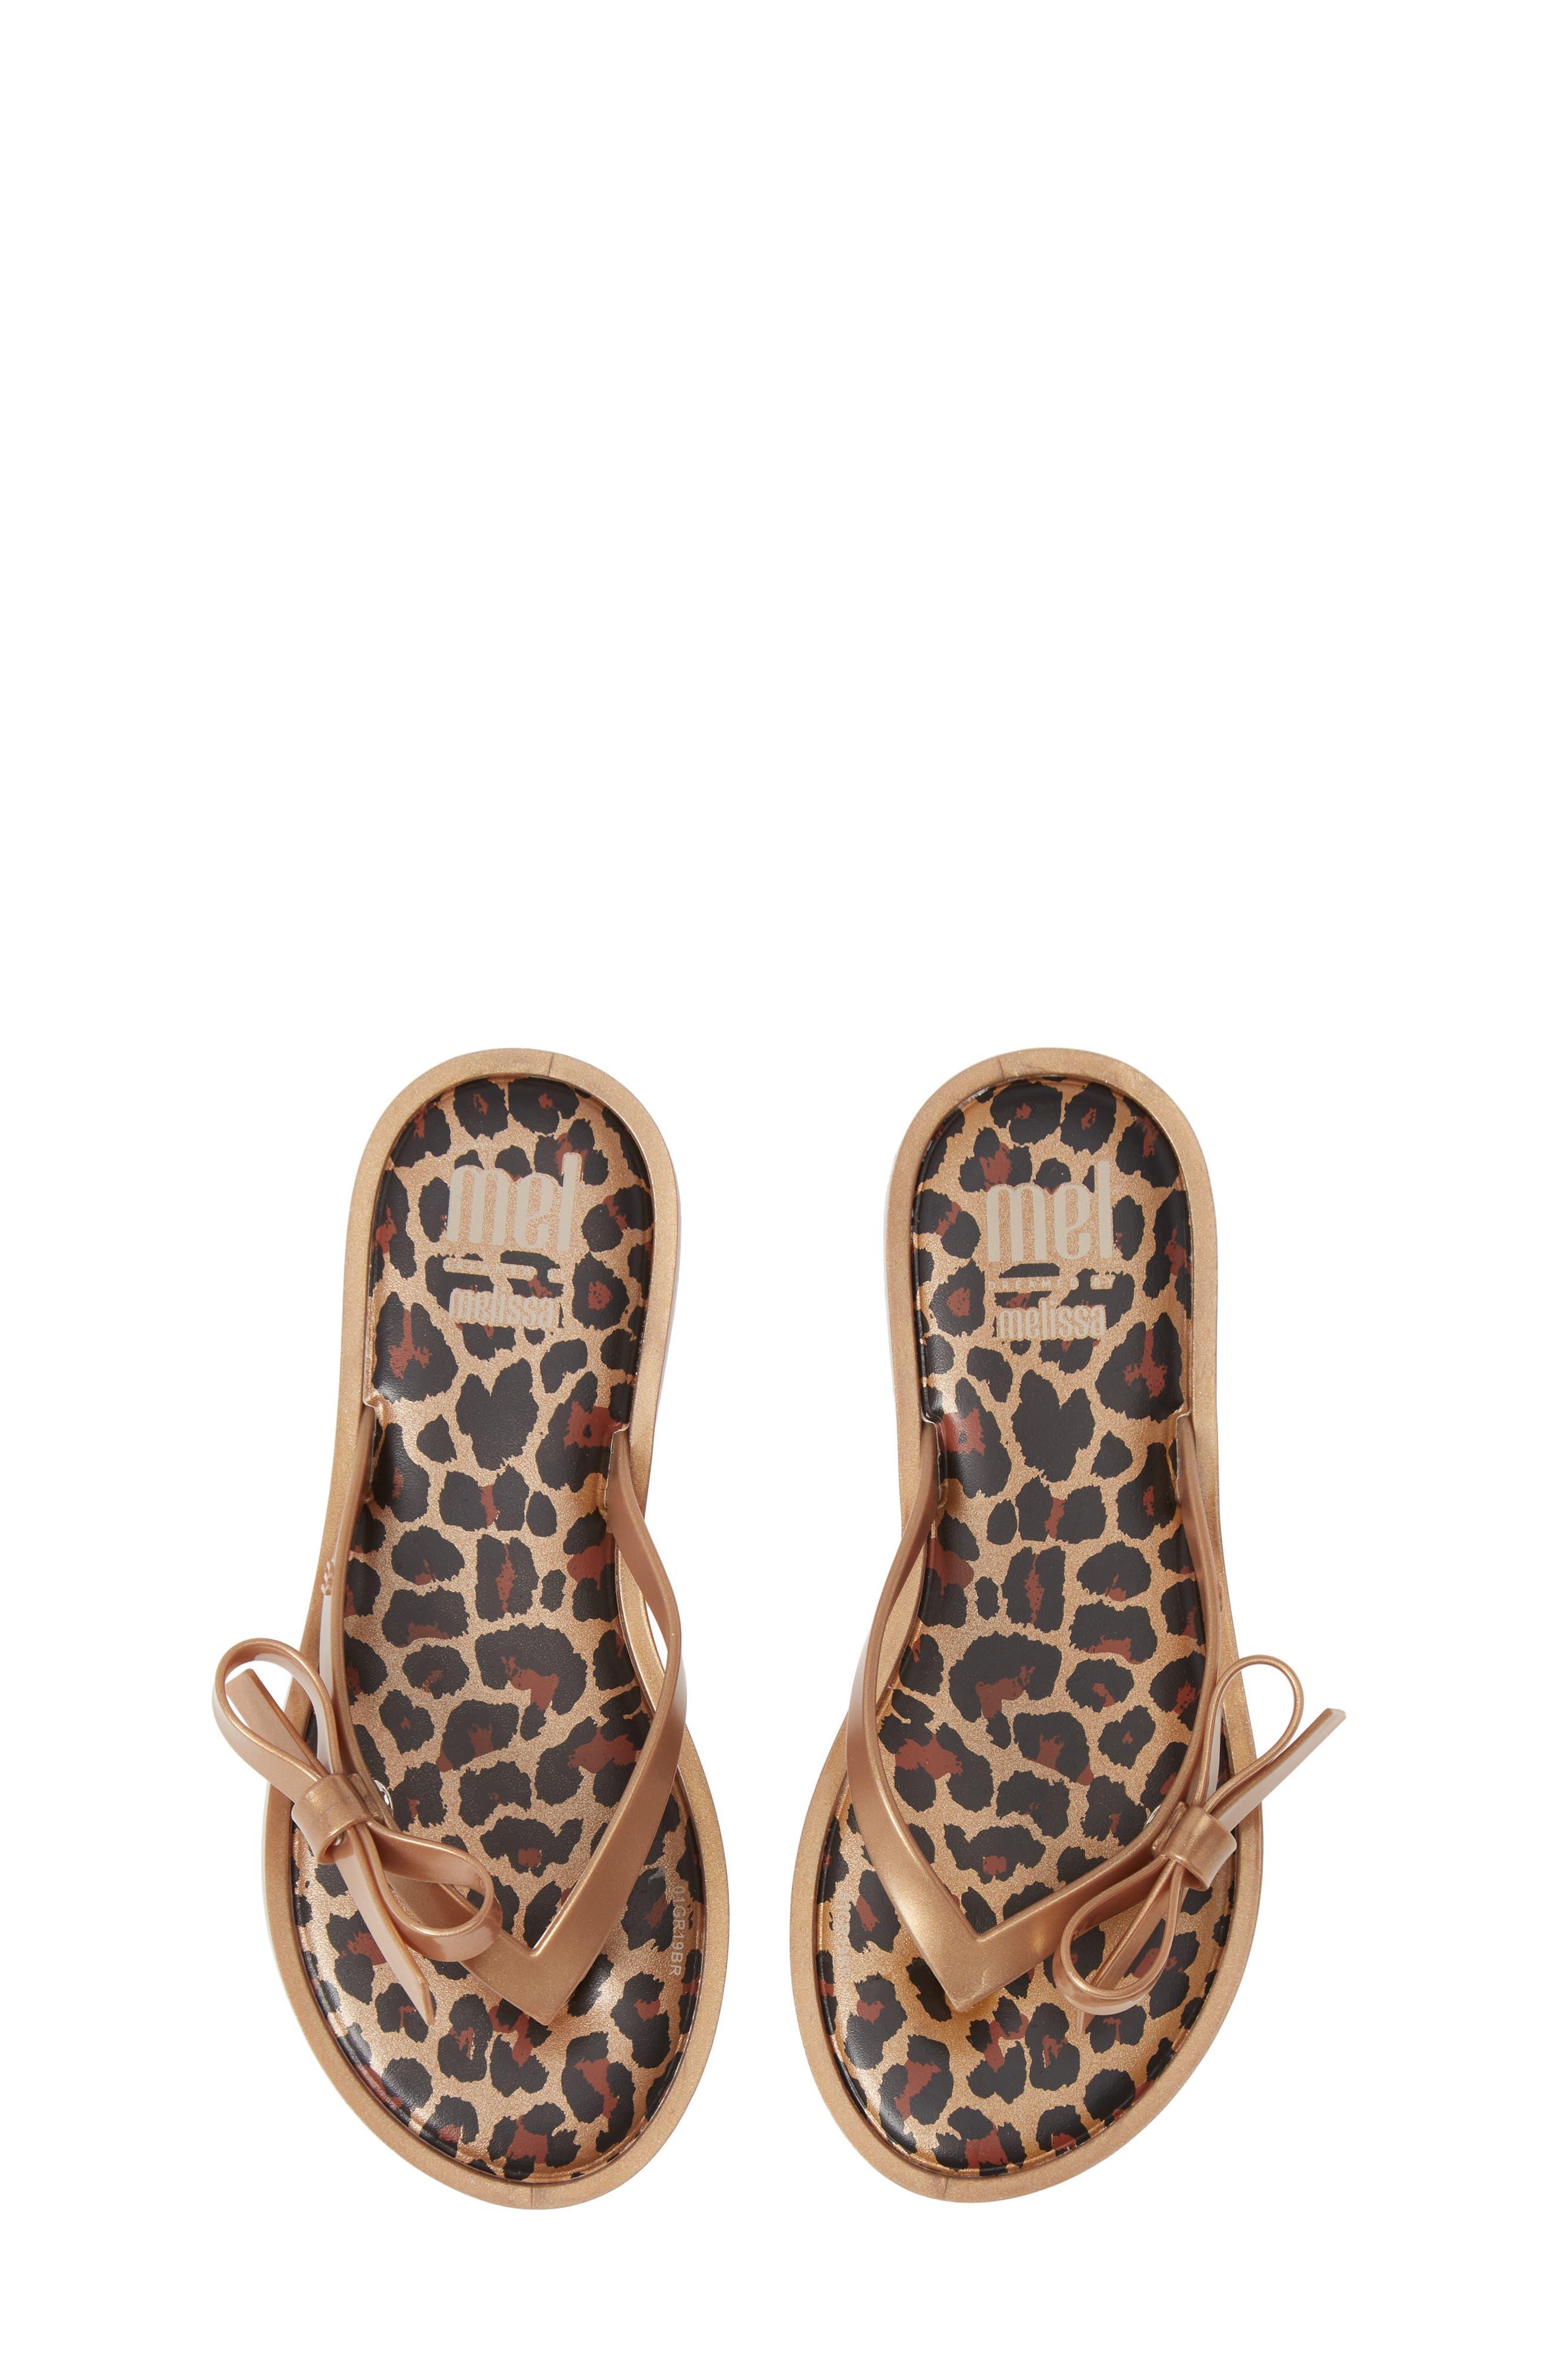 Toddler Girls Mel By Melissa Bow Flip Flop Sandal Size 11 M  Metallic